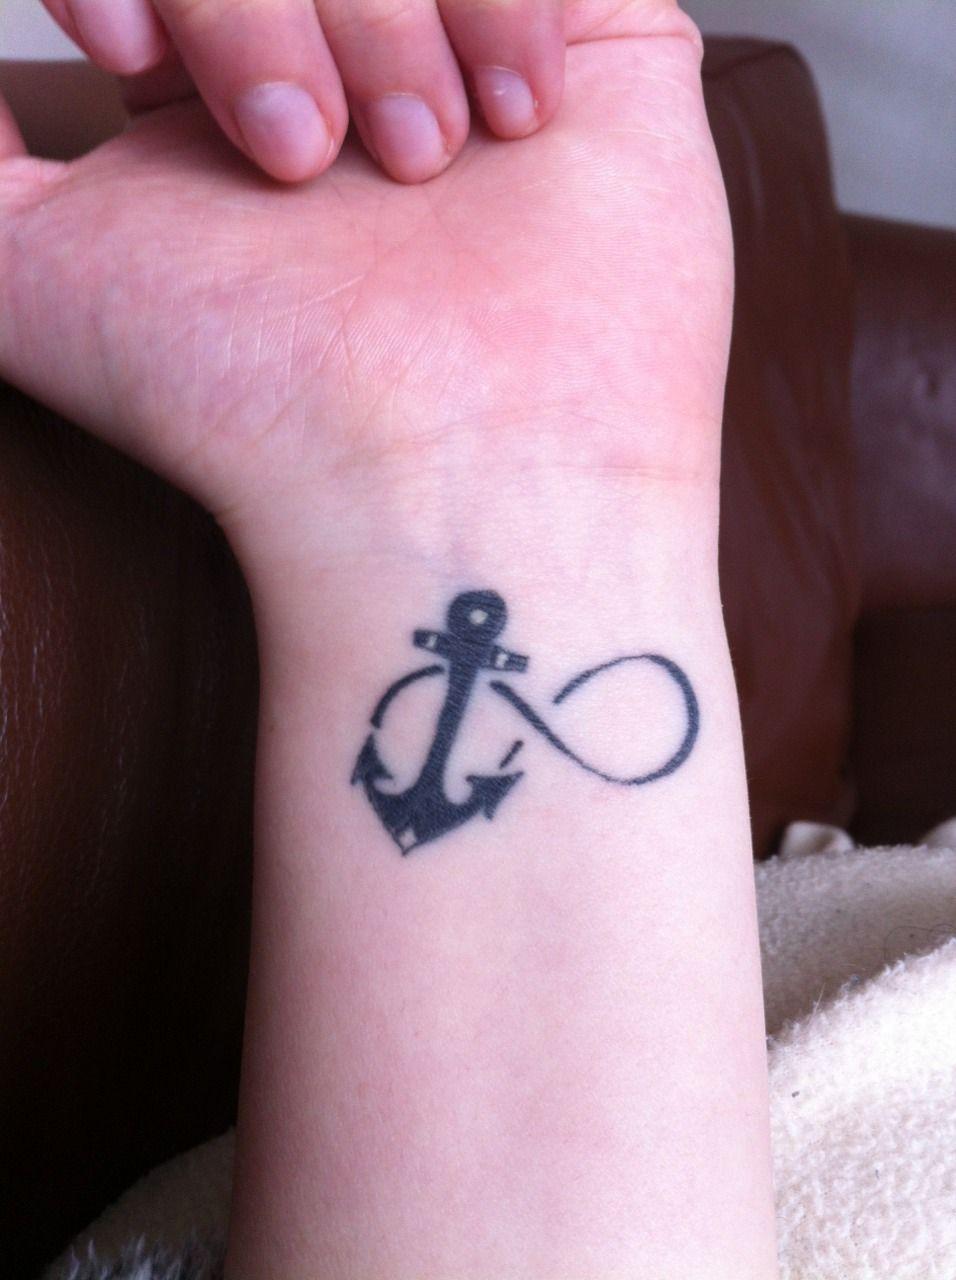 f5e9f8cca Simple-Anchor-Wrist-Tattoos_Simple-Anchor-Wrist-Tattoos | Tattoo ...